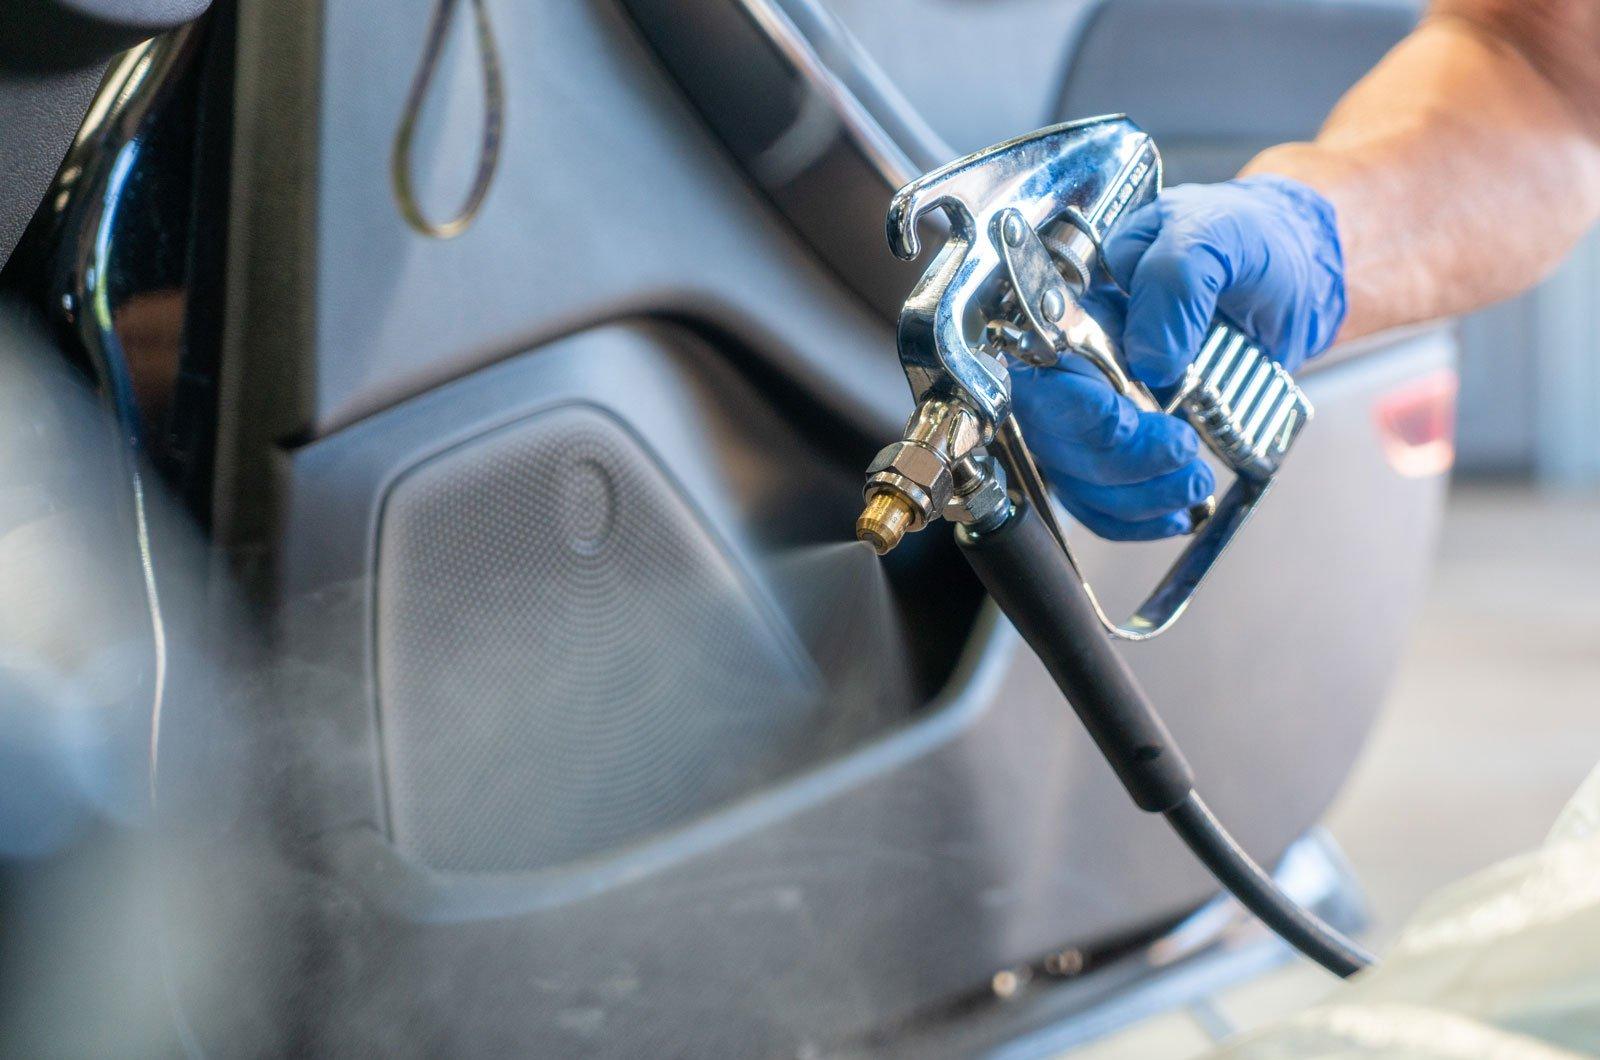 Disinfecting car